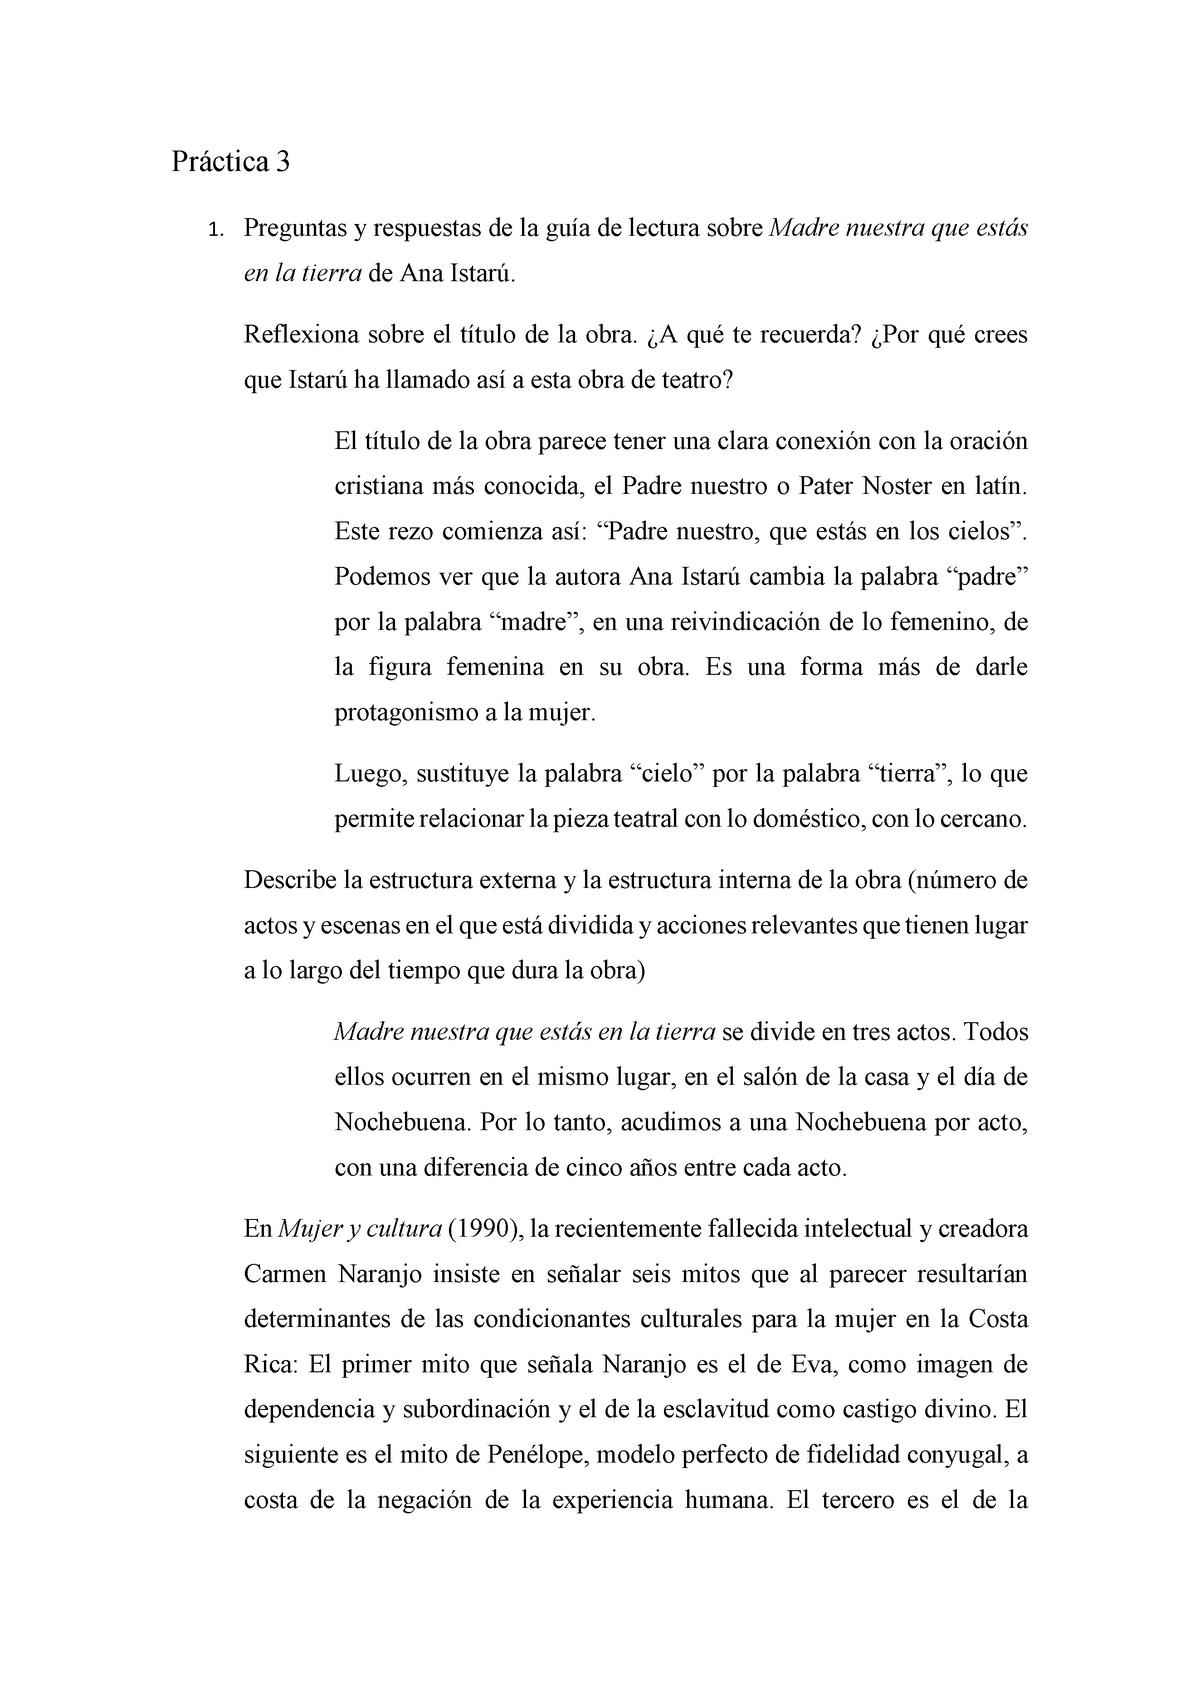 Práctica 3 Literatura Hispanoamericana Contemporánea 602